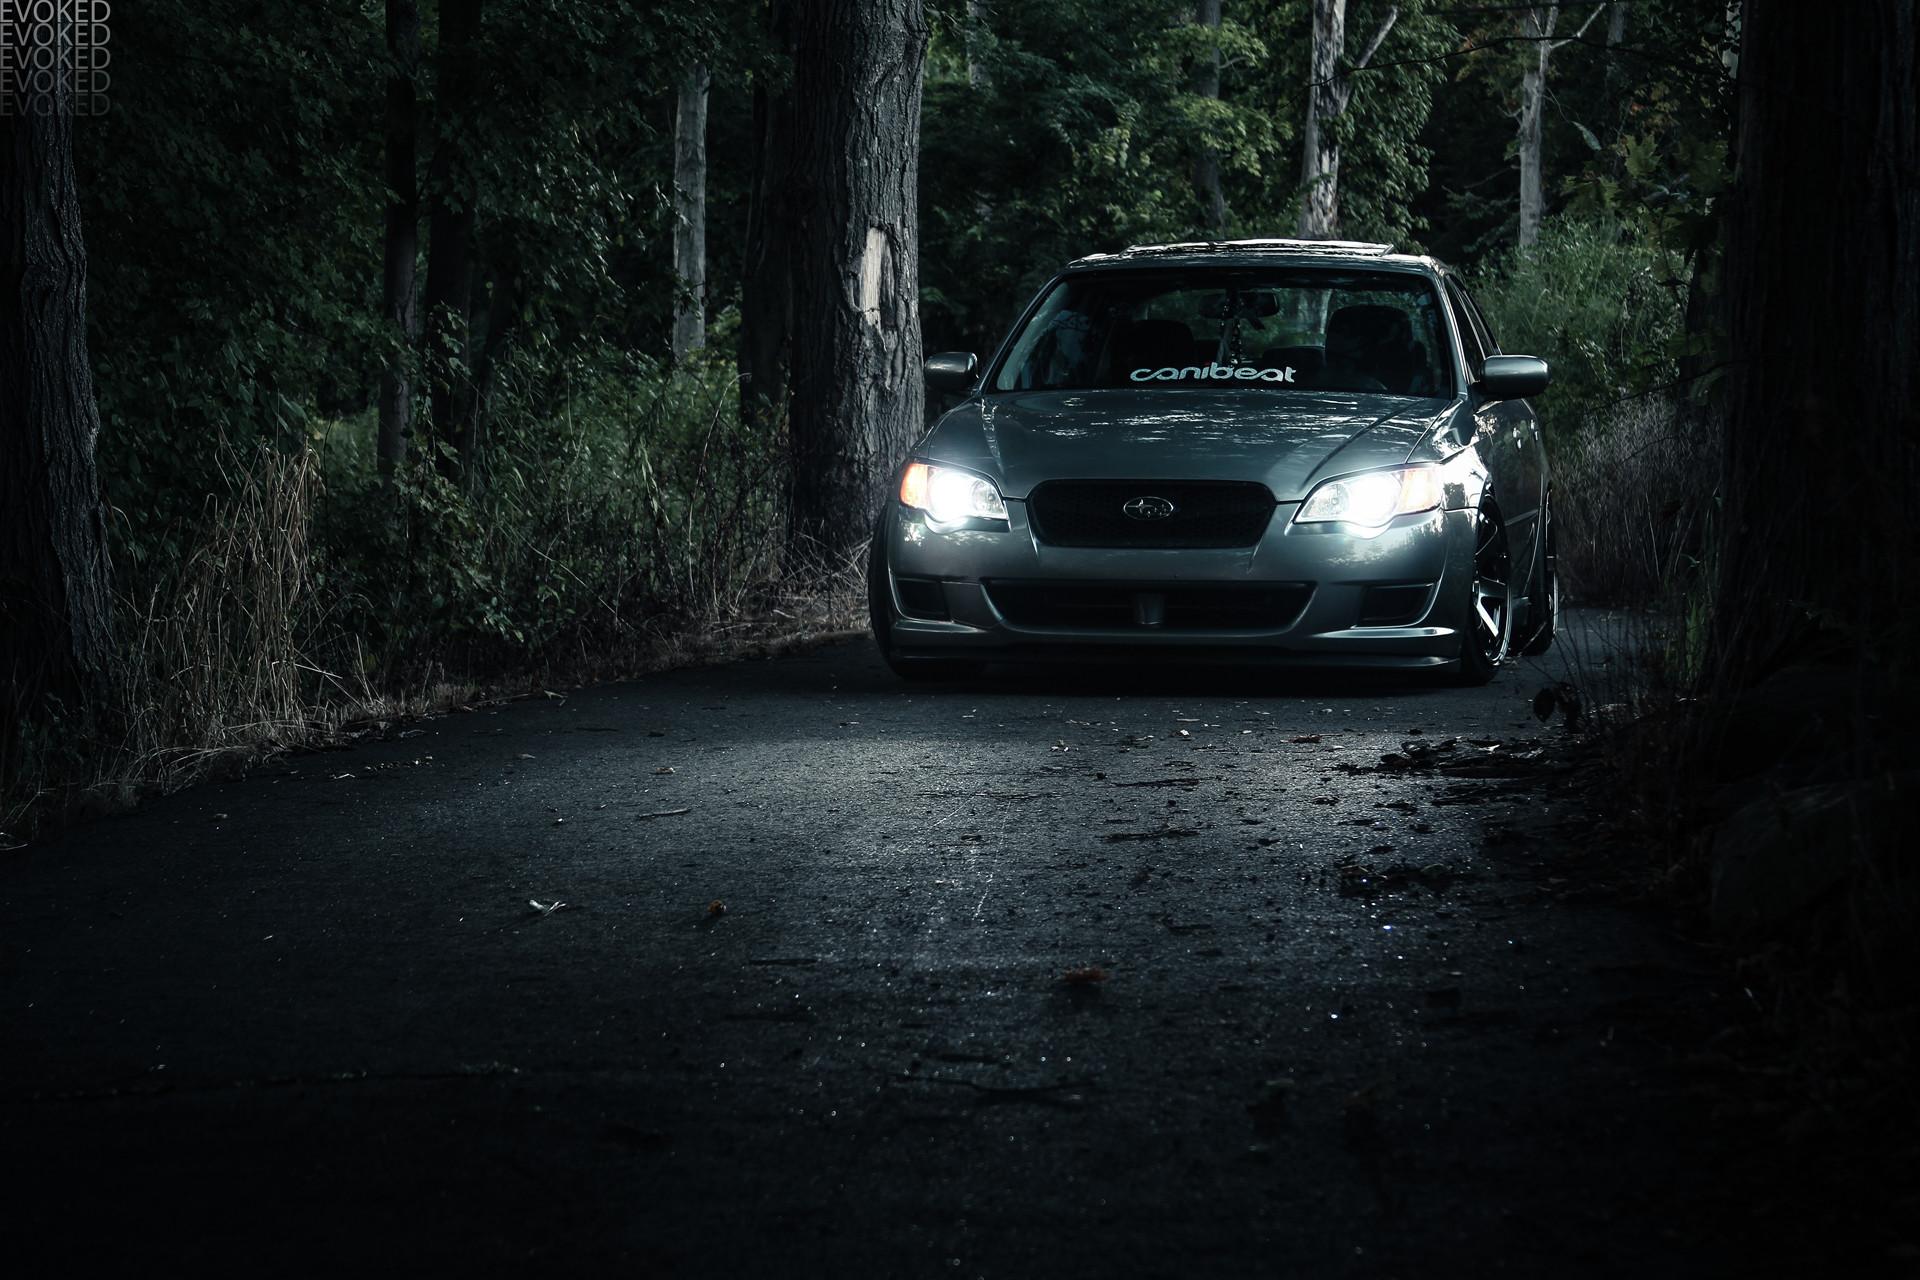 Subaru wrx wallpaper hd 68 images - Legacy wallpaper ...